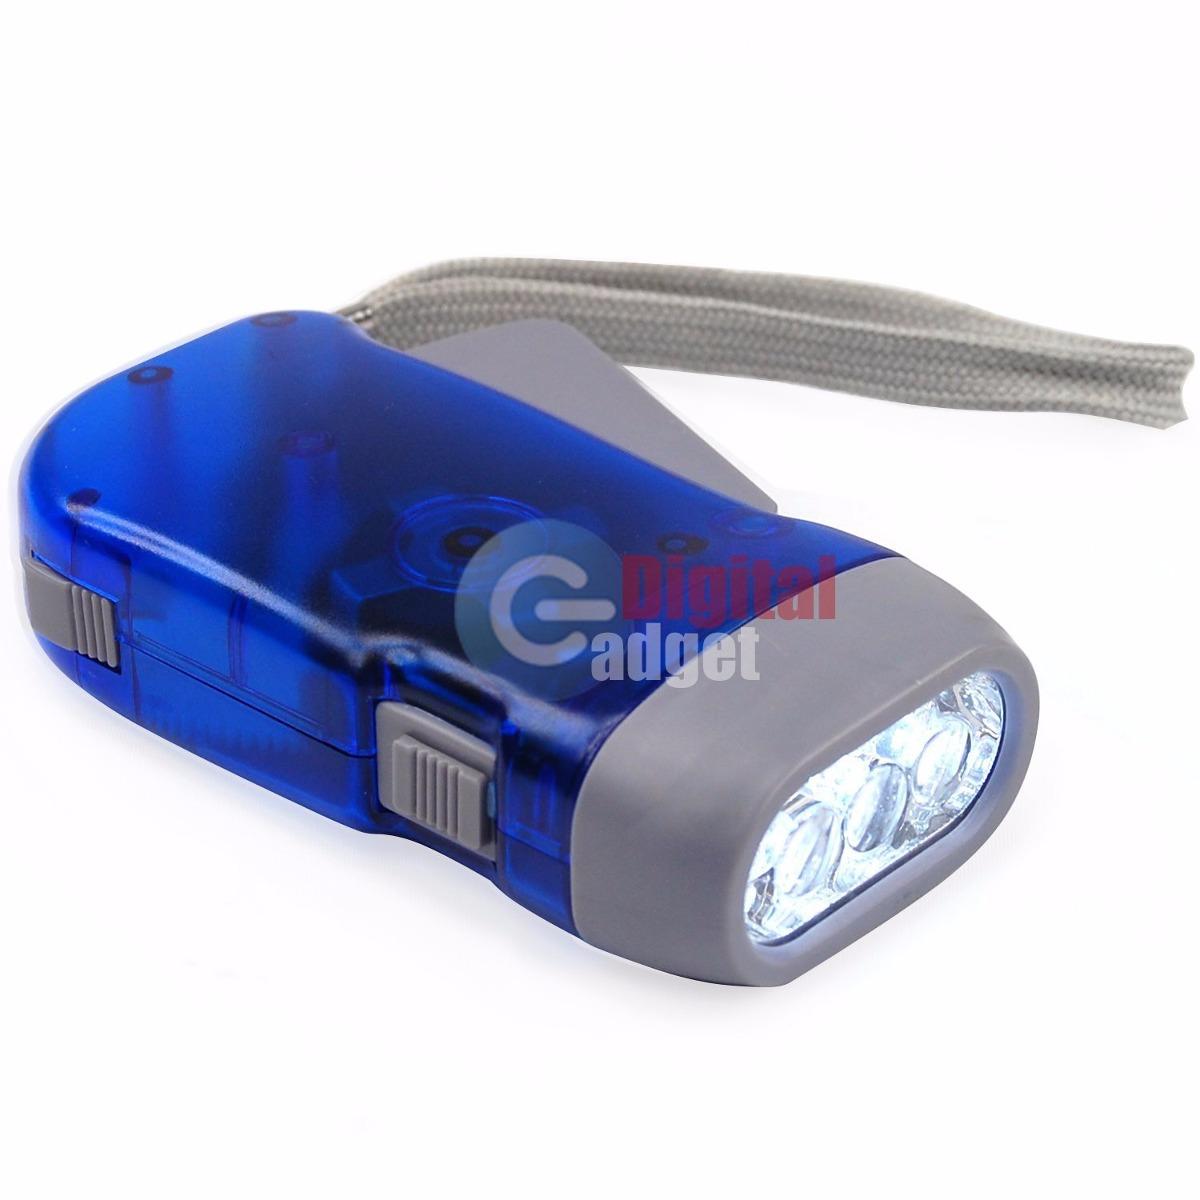 Lampara linterna led recargable portatil mano xenon dinamo - Linterna recargable led ...